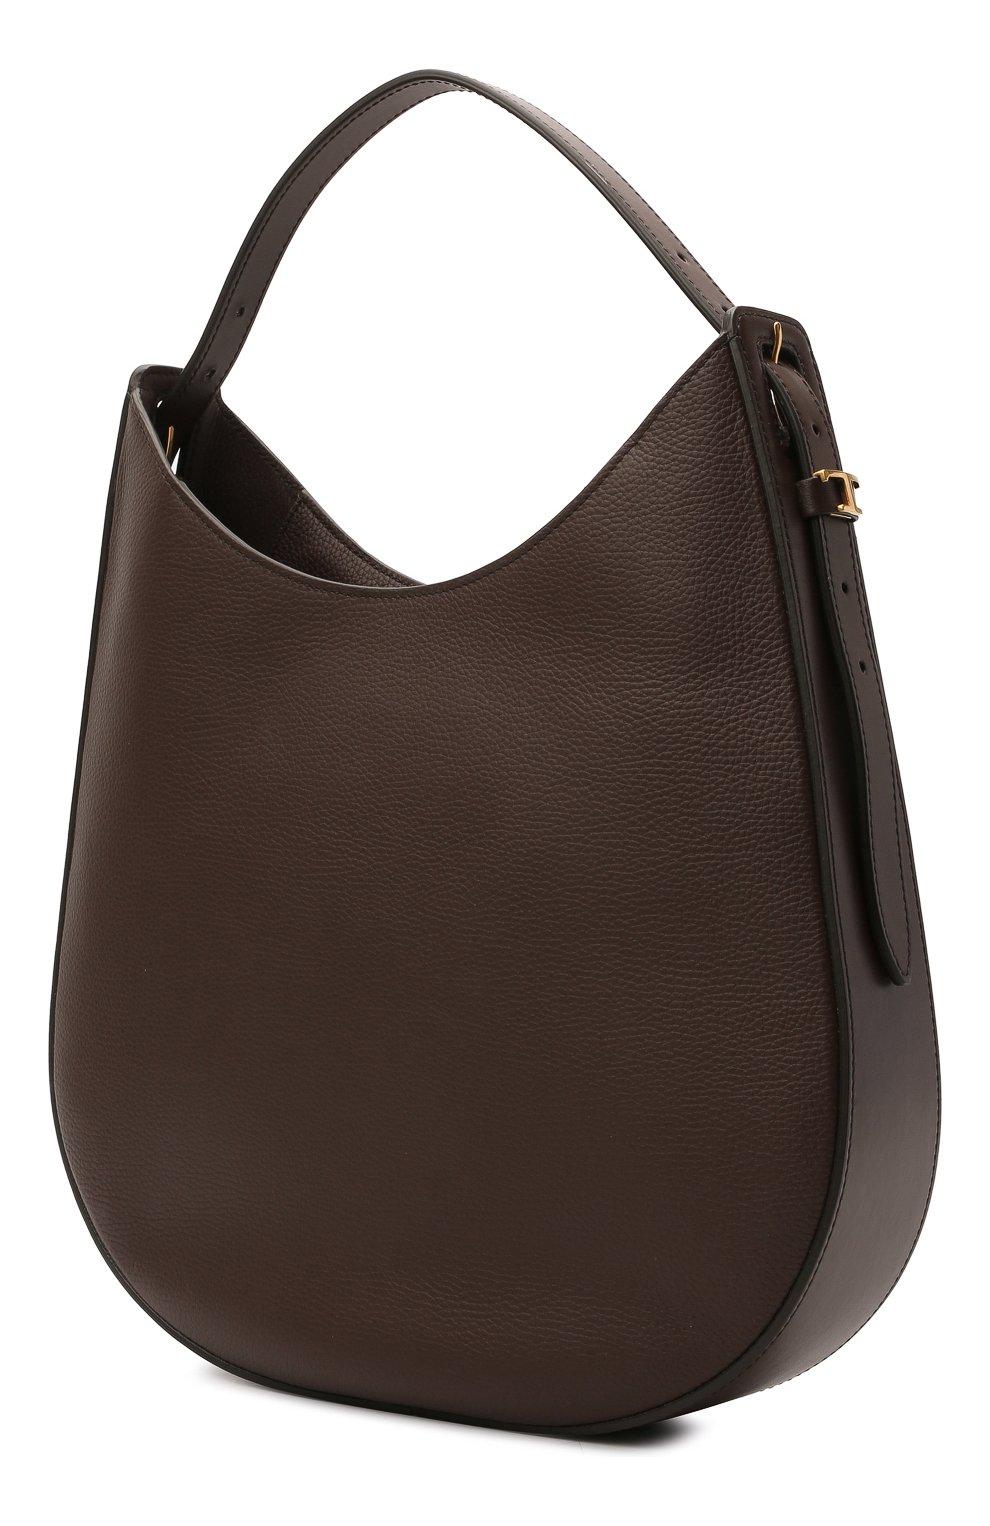 Женская сумка oboe TOD'S темно-коричневого цвета, арт. XBWA0RS0300P6Y | Фото 3 (Сумки-технические: Сумки top-handle; Материал: Натуральная кожа; Размер: large)